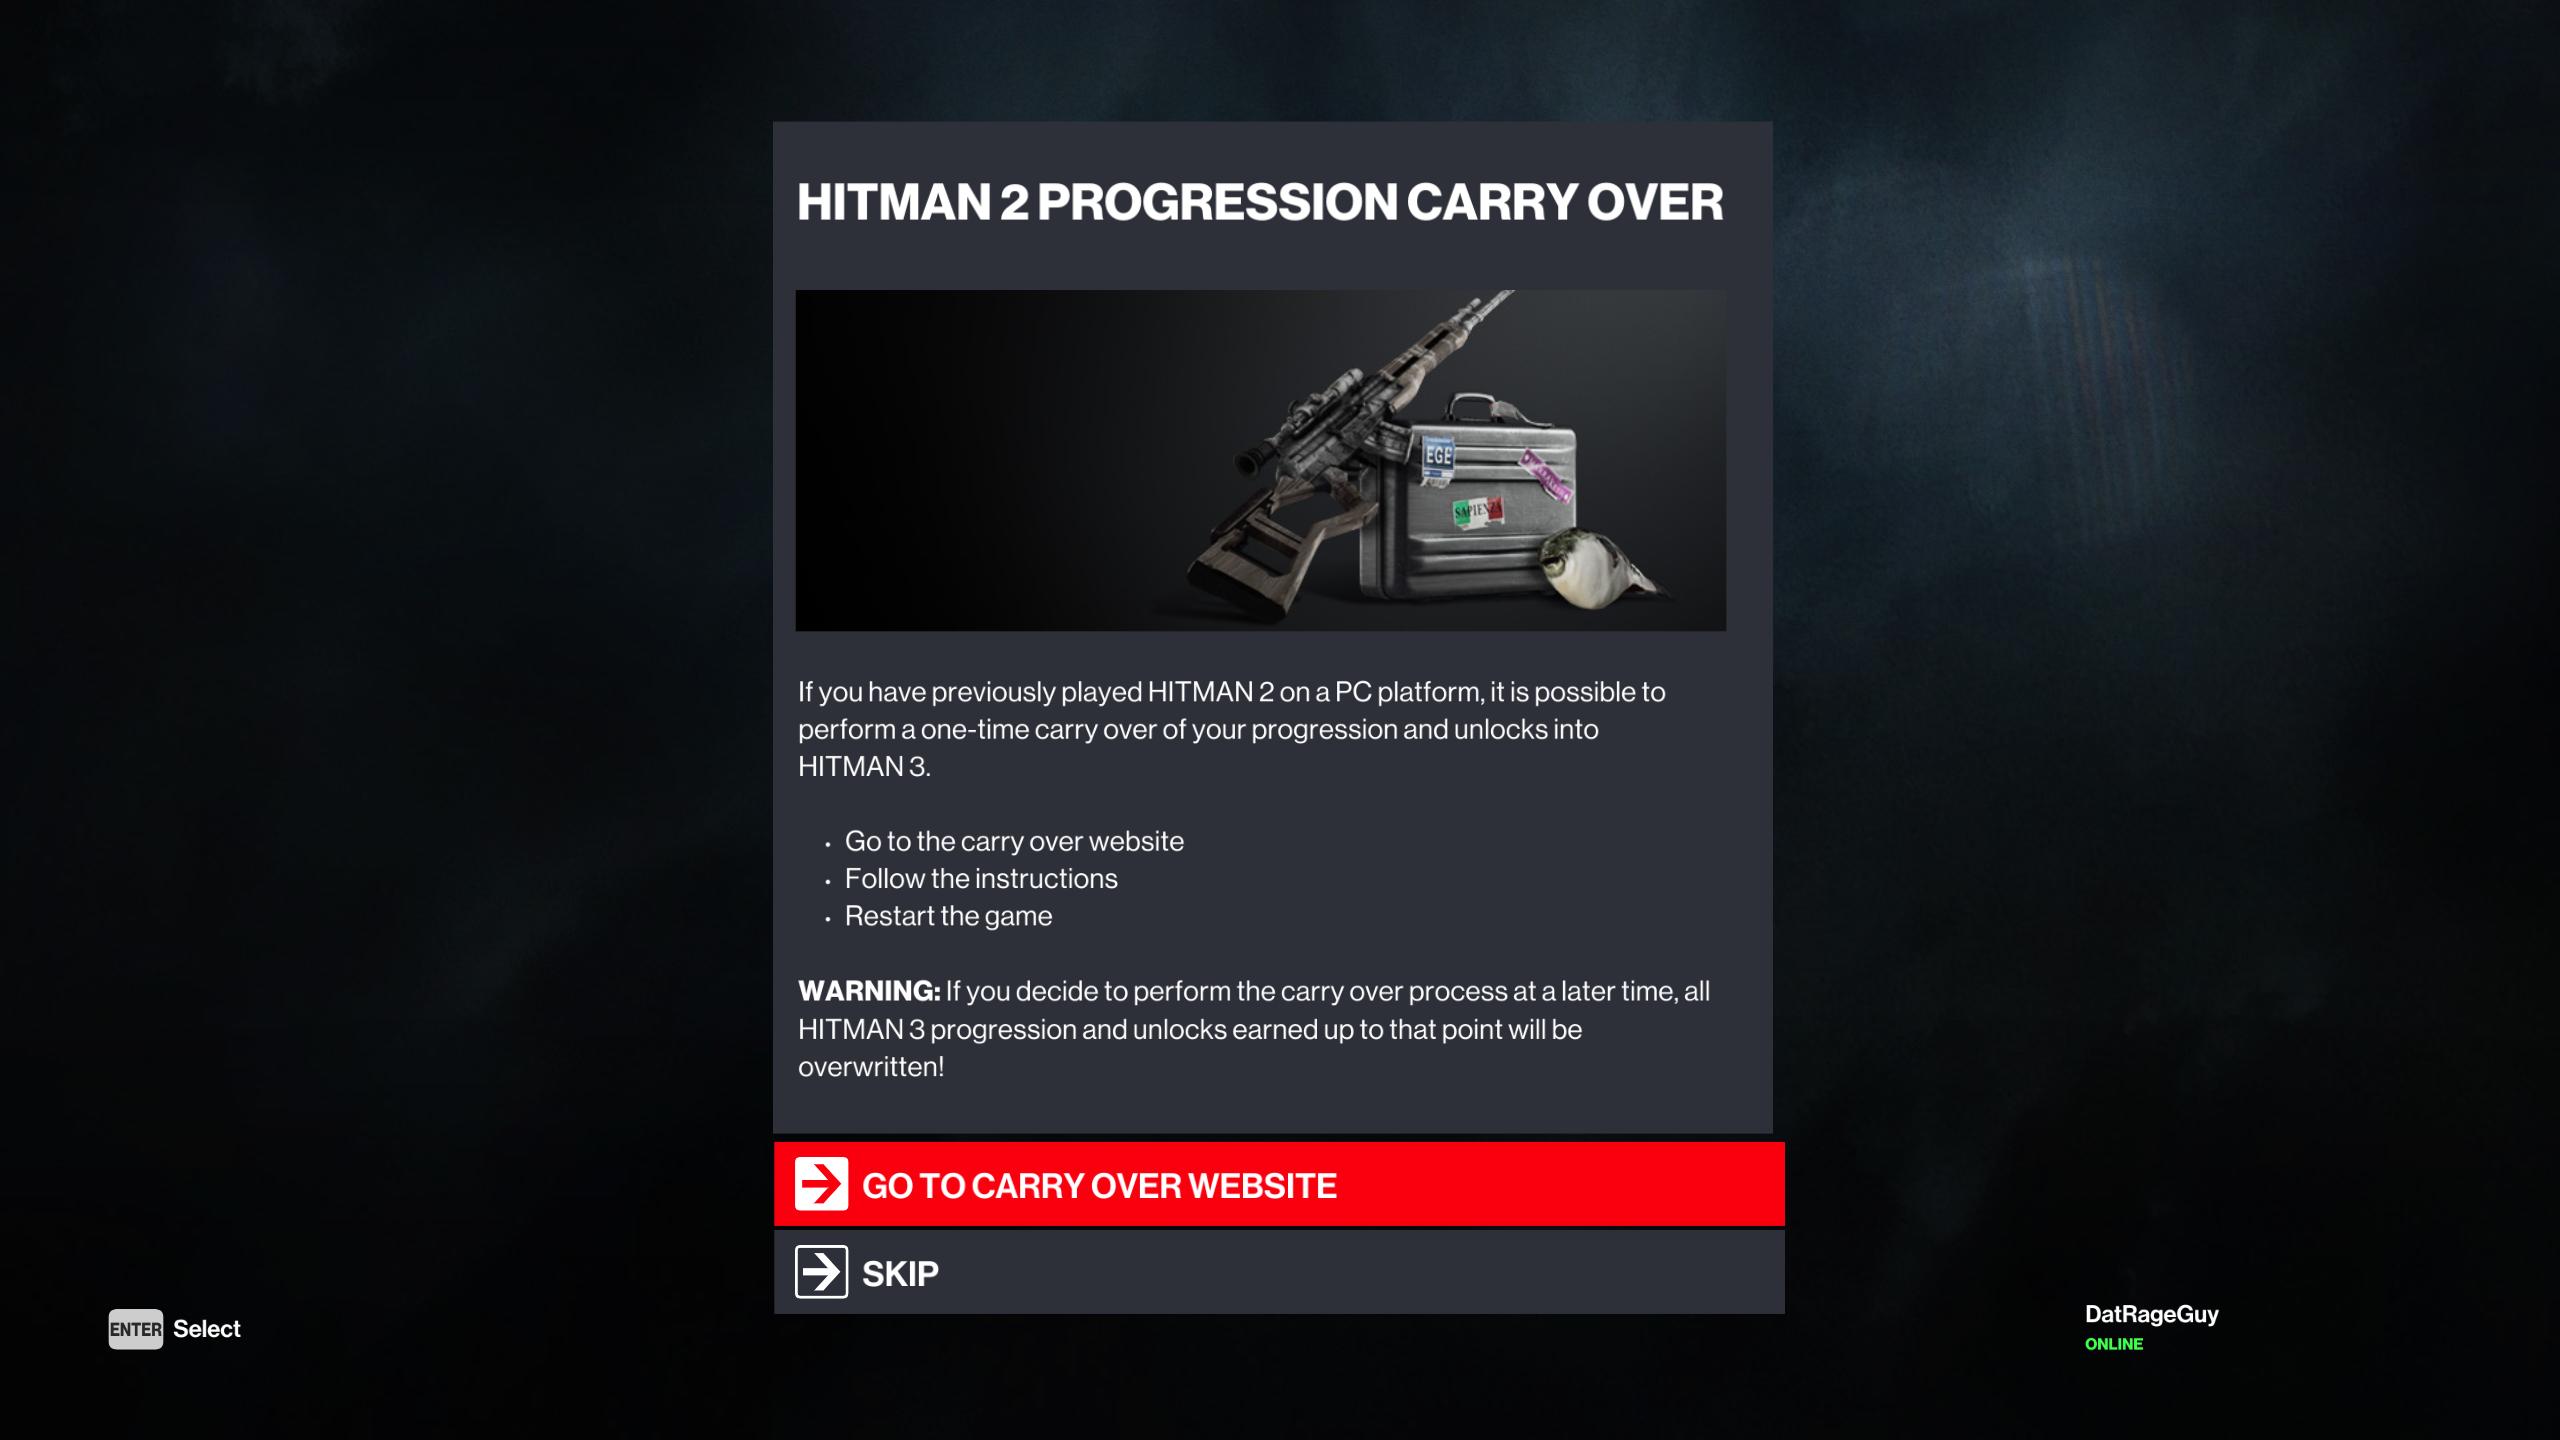 how to transfer hitman 2 progression to hitman 3